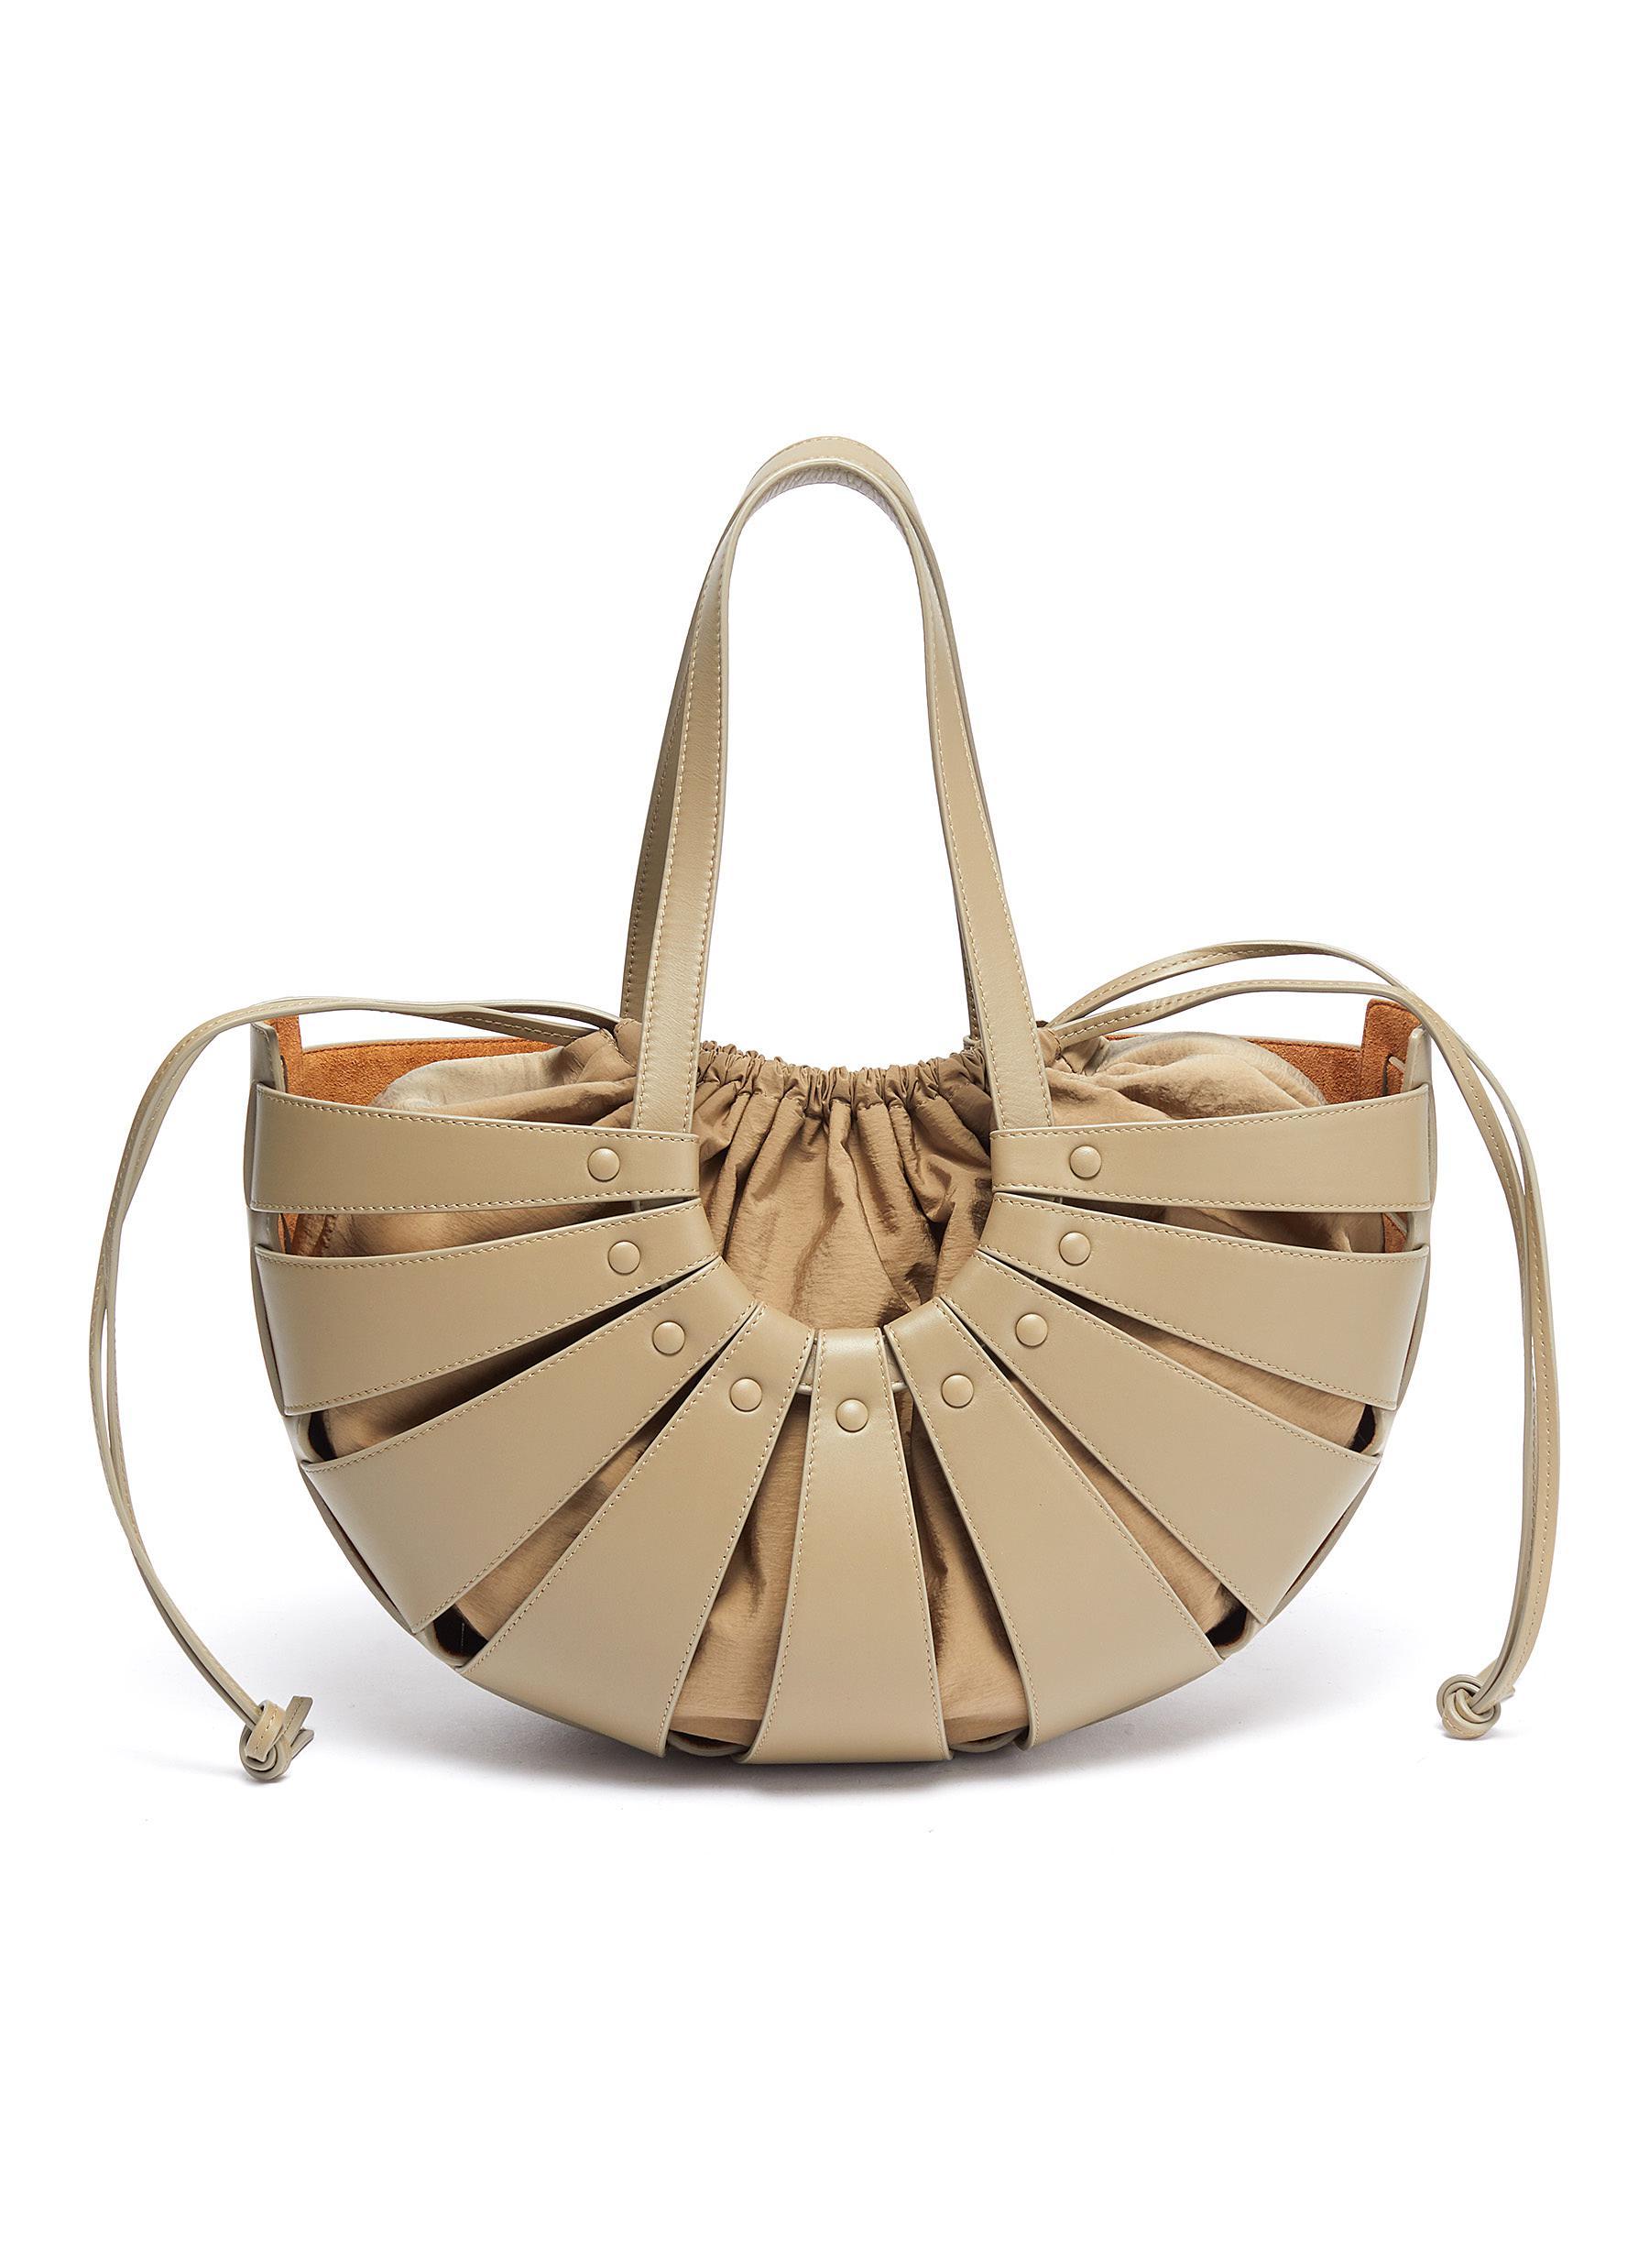 Basket leather tote with nylon pouch - BOTTEGA VENETA - Modalova